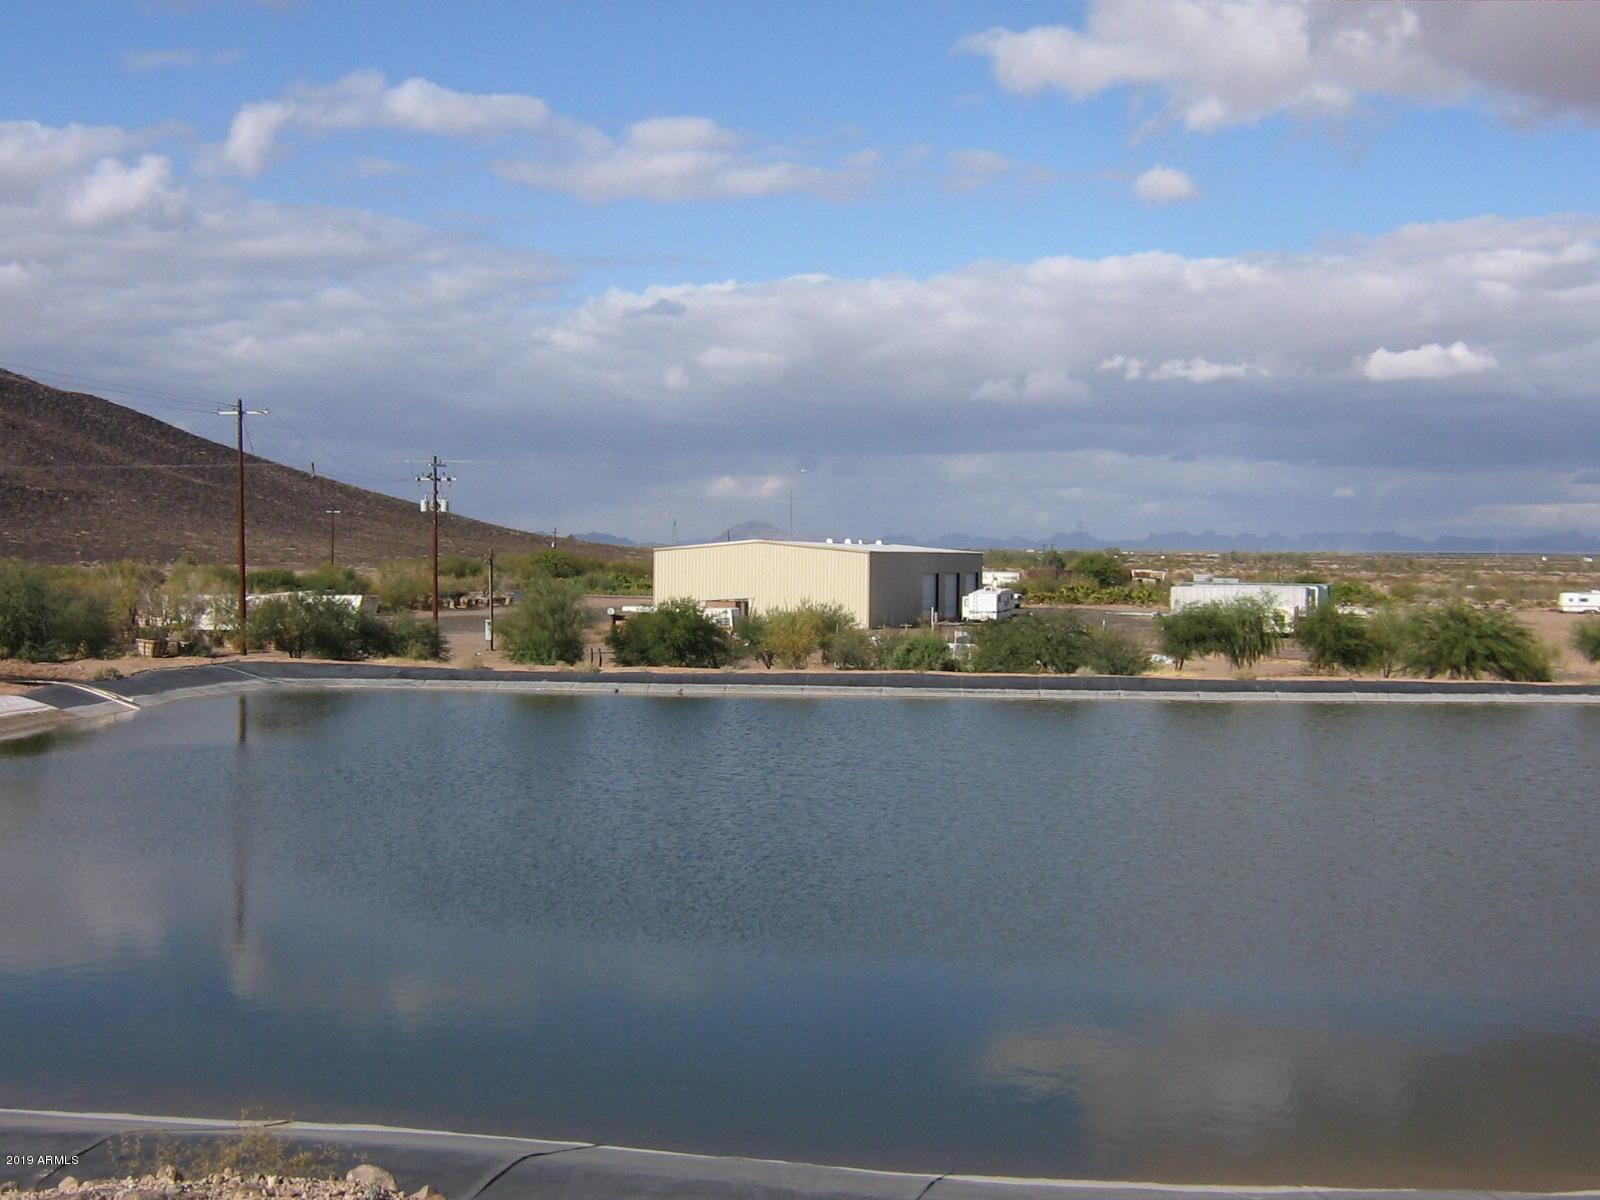 13237 N Ave 76 East -- DATELAND, AZ